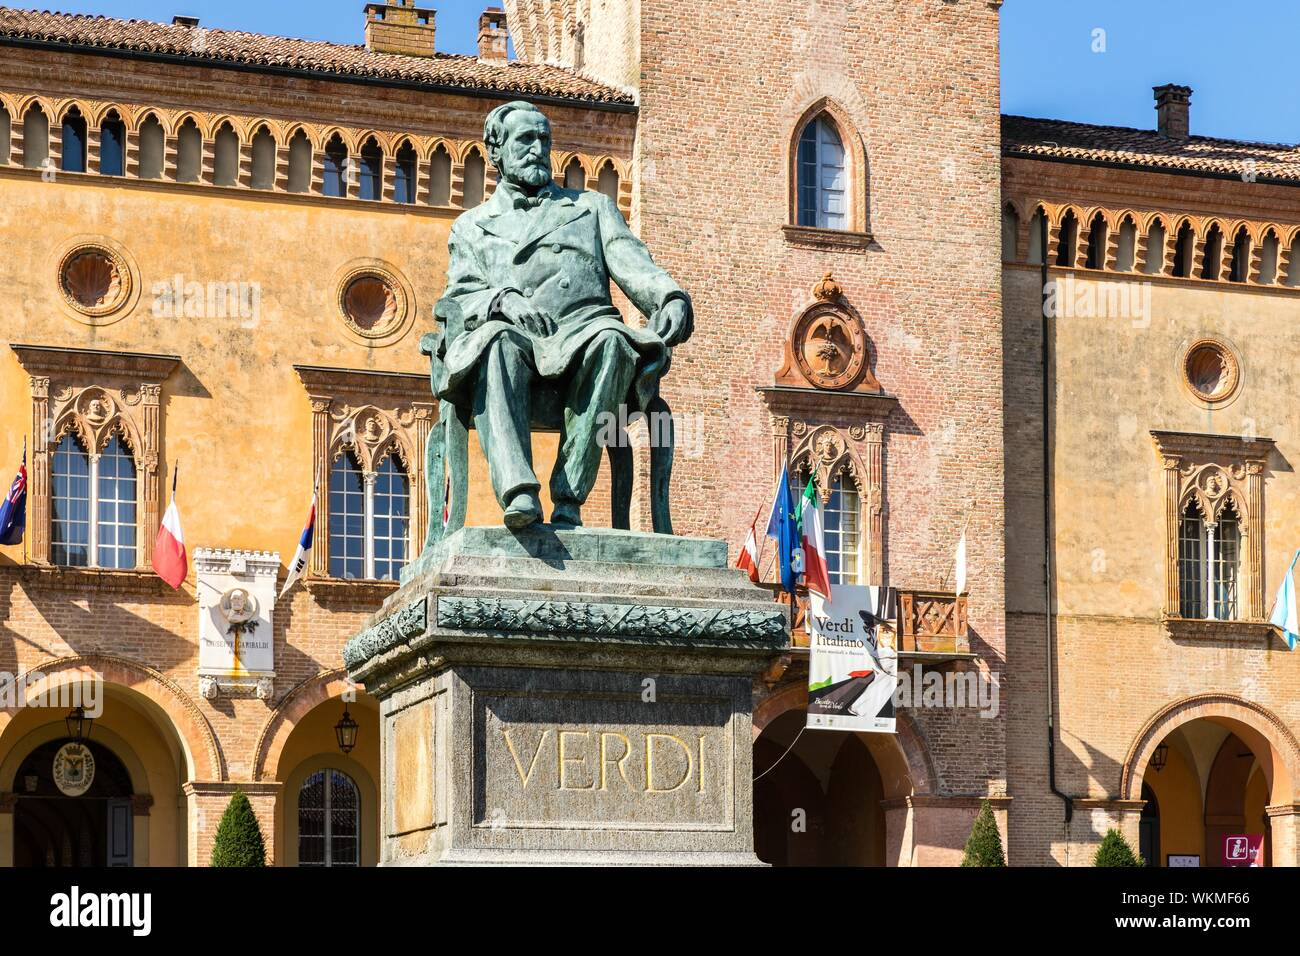 Teatro Verdi Parma Stockfotos & Teatro Verdi Parma Bilder ...